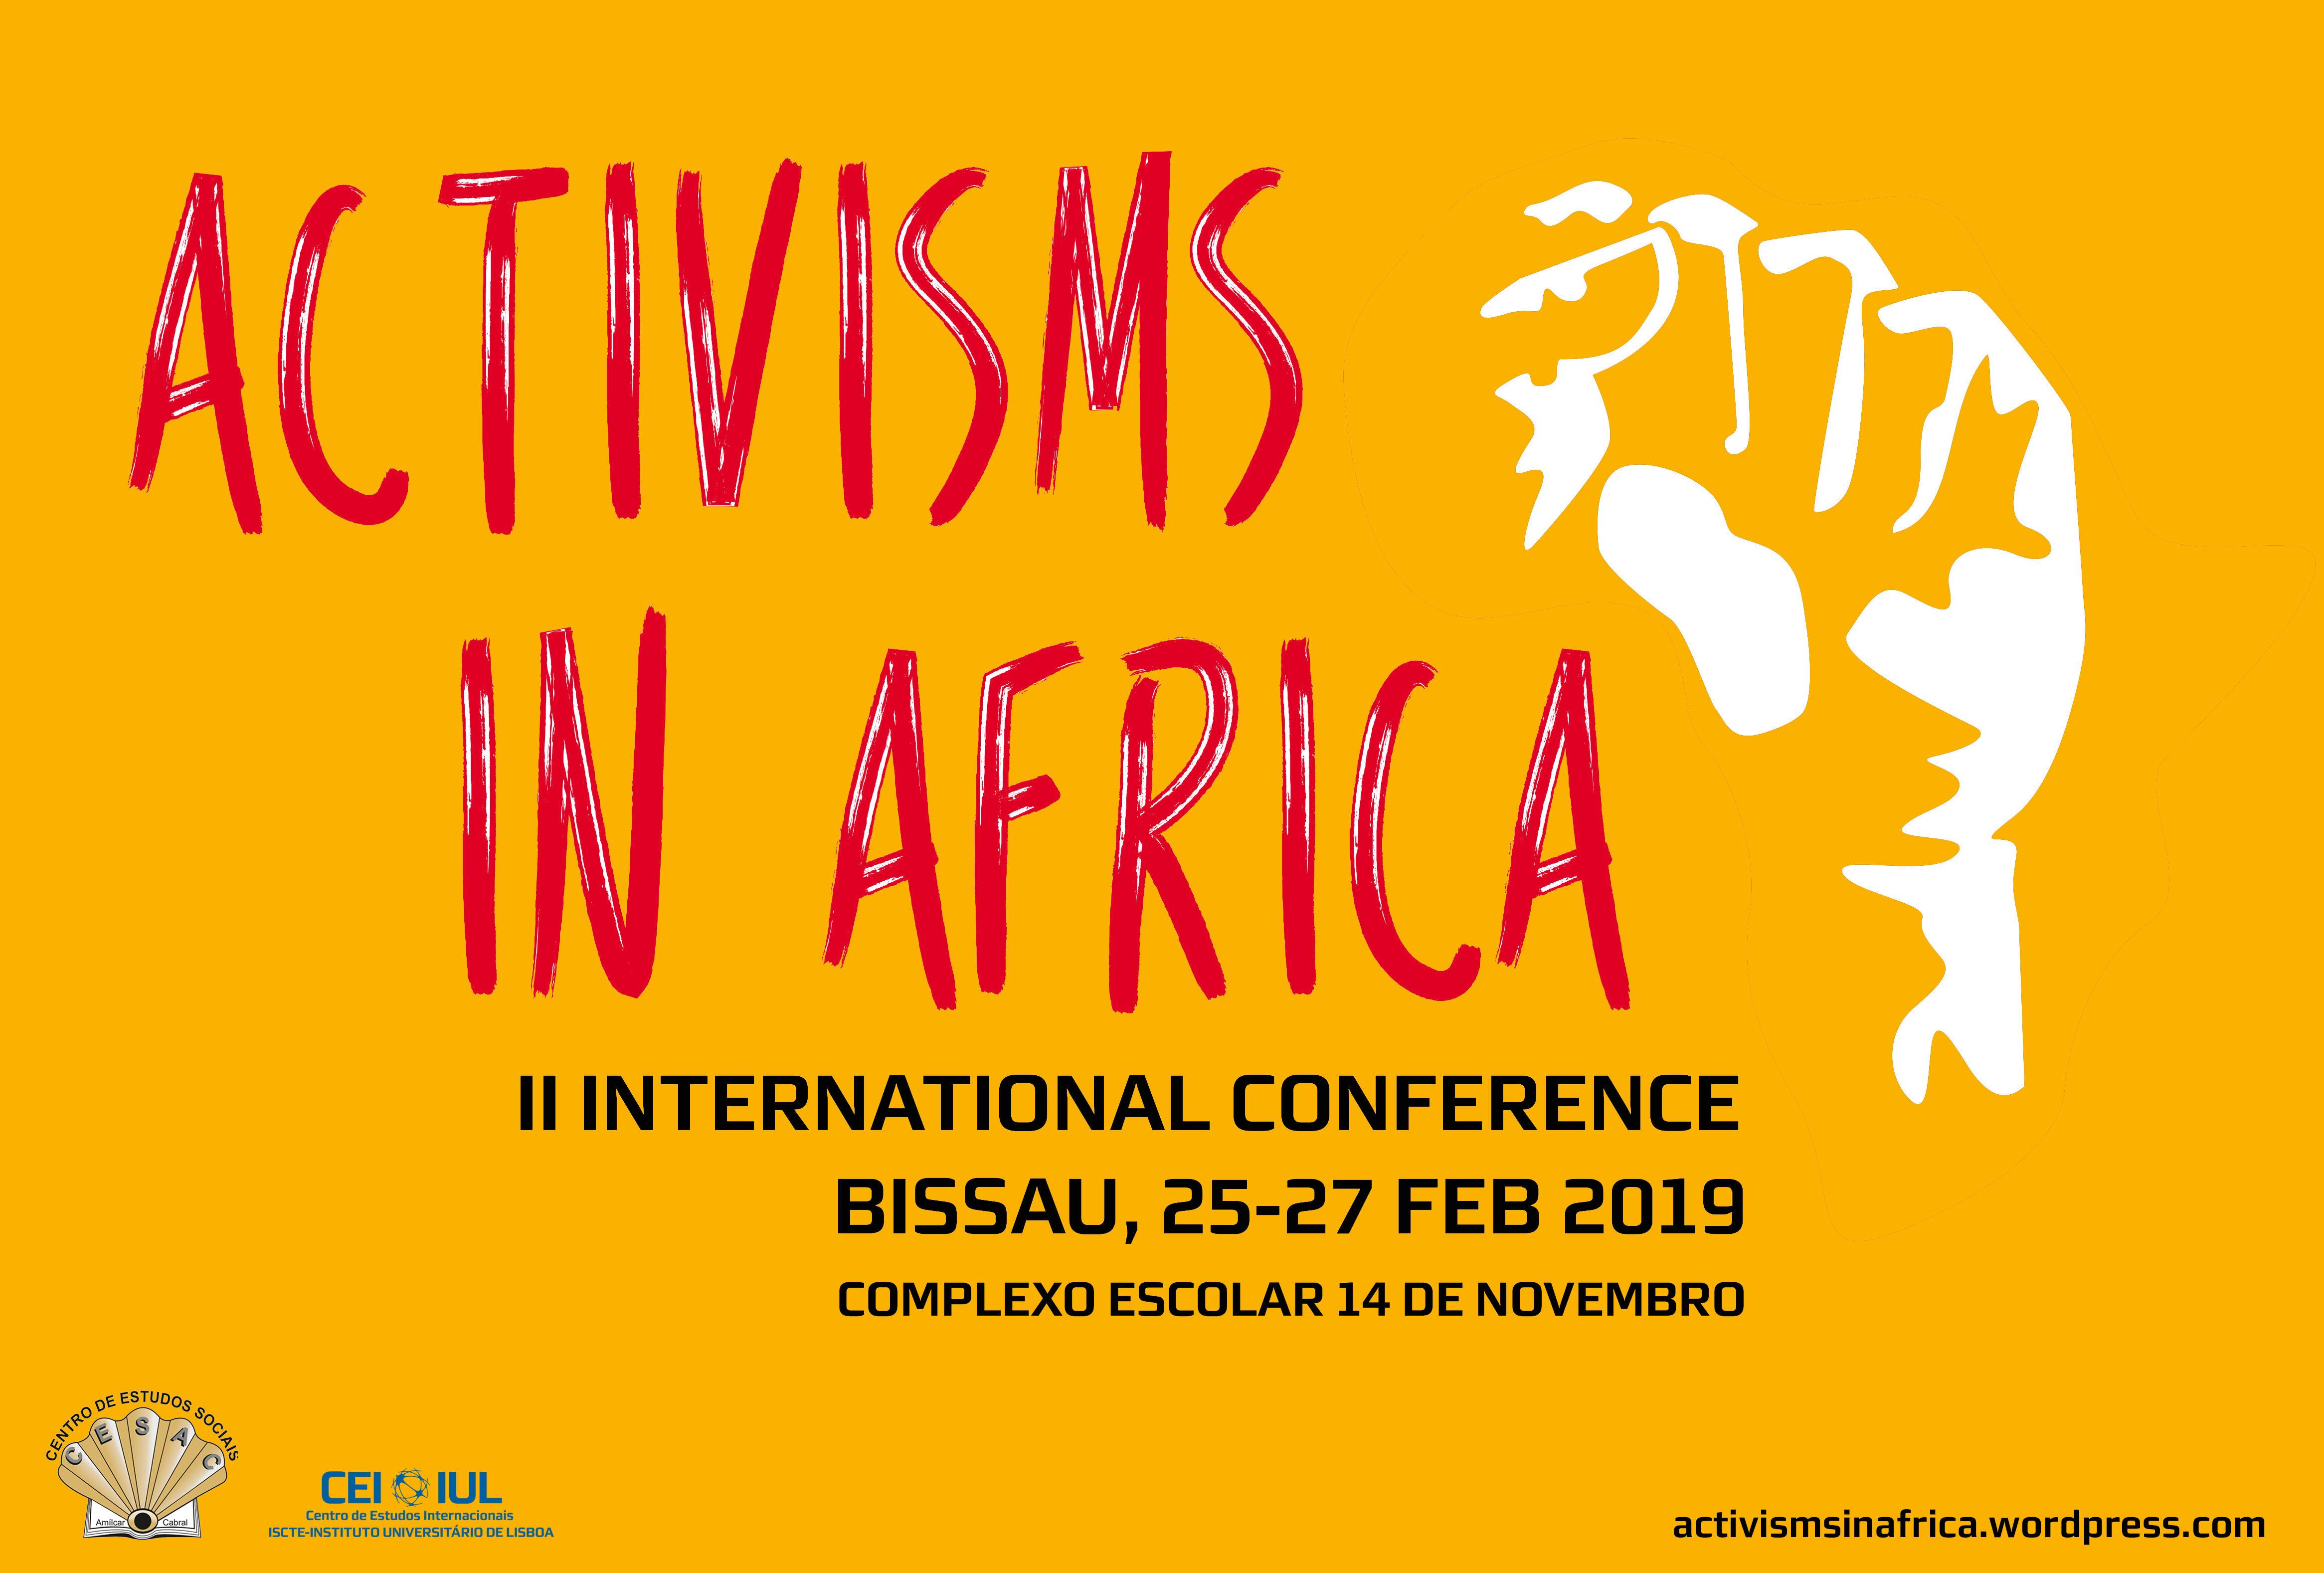 Activisms in Africa